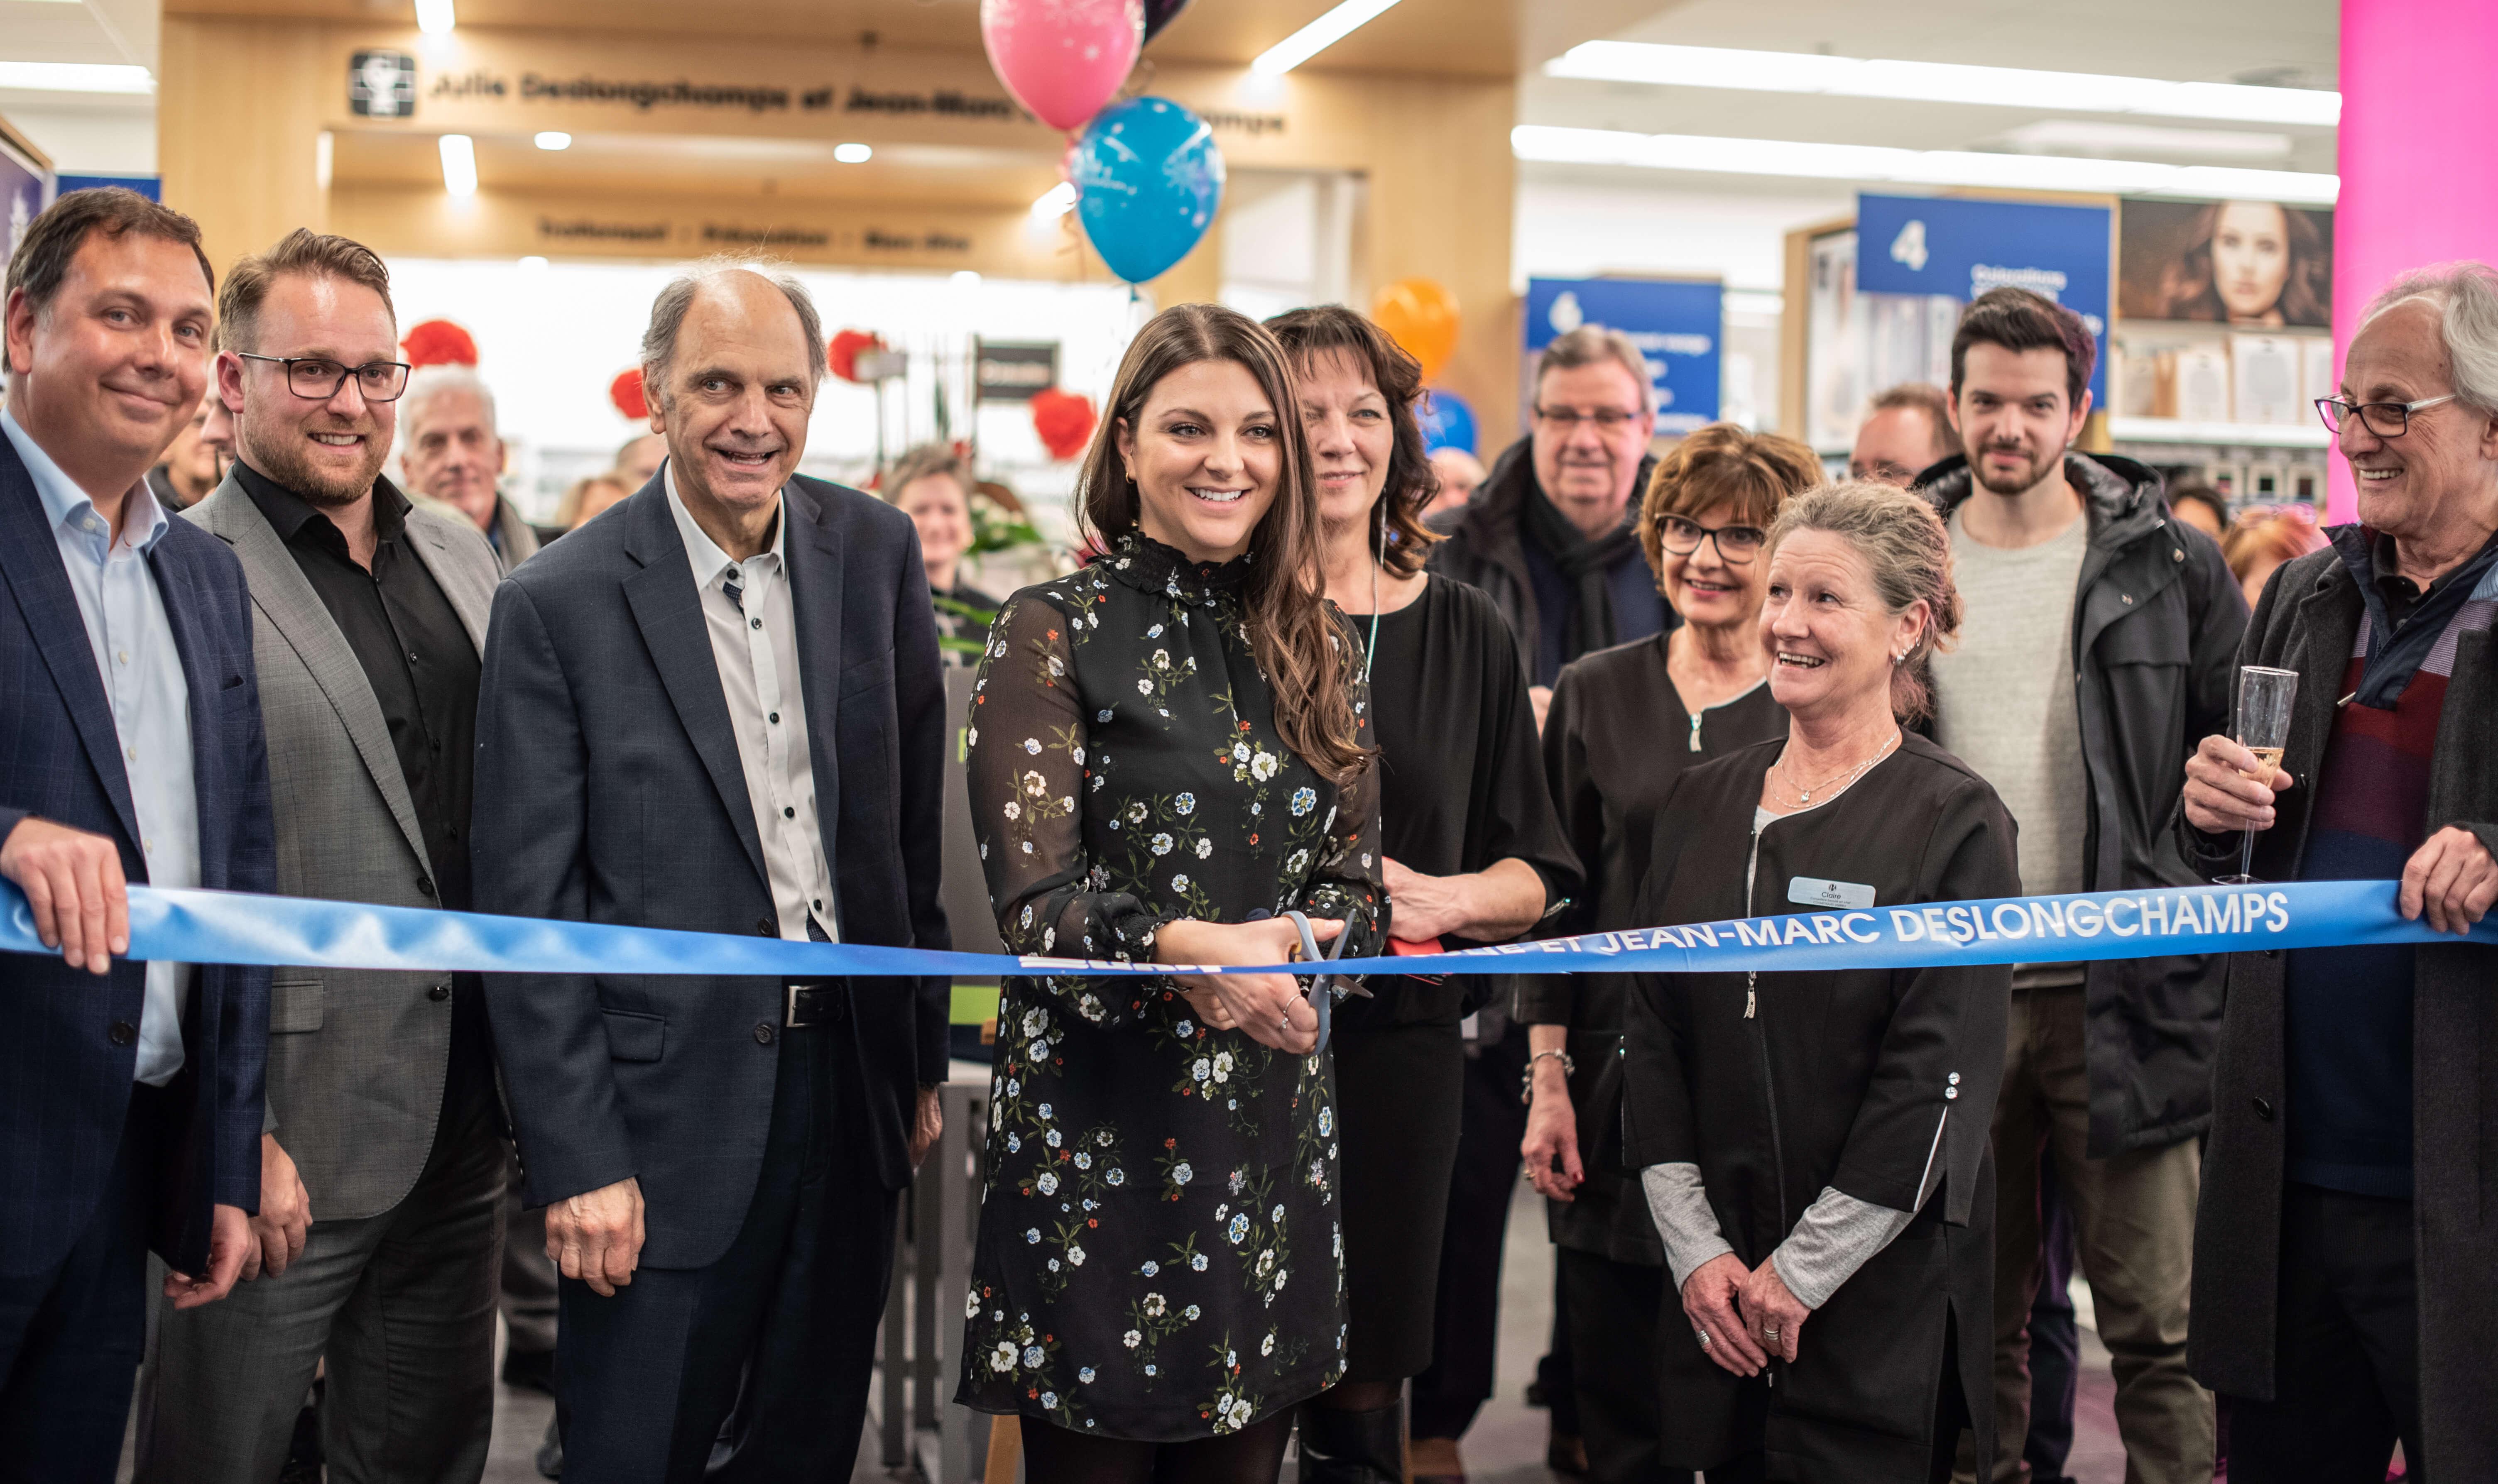 Inauguration pharmacie Deslongchamps